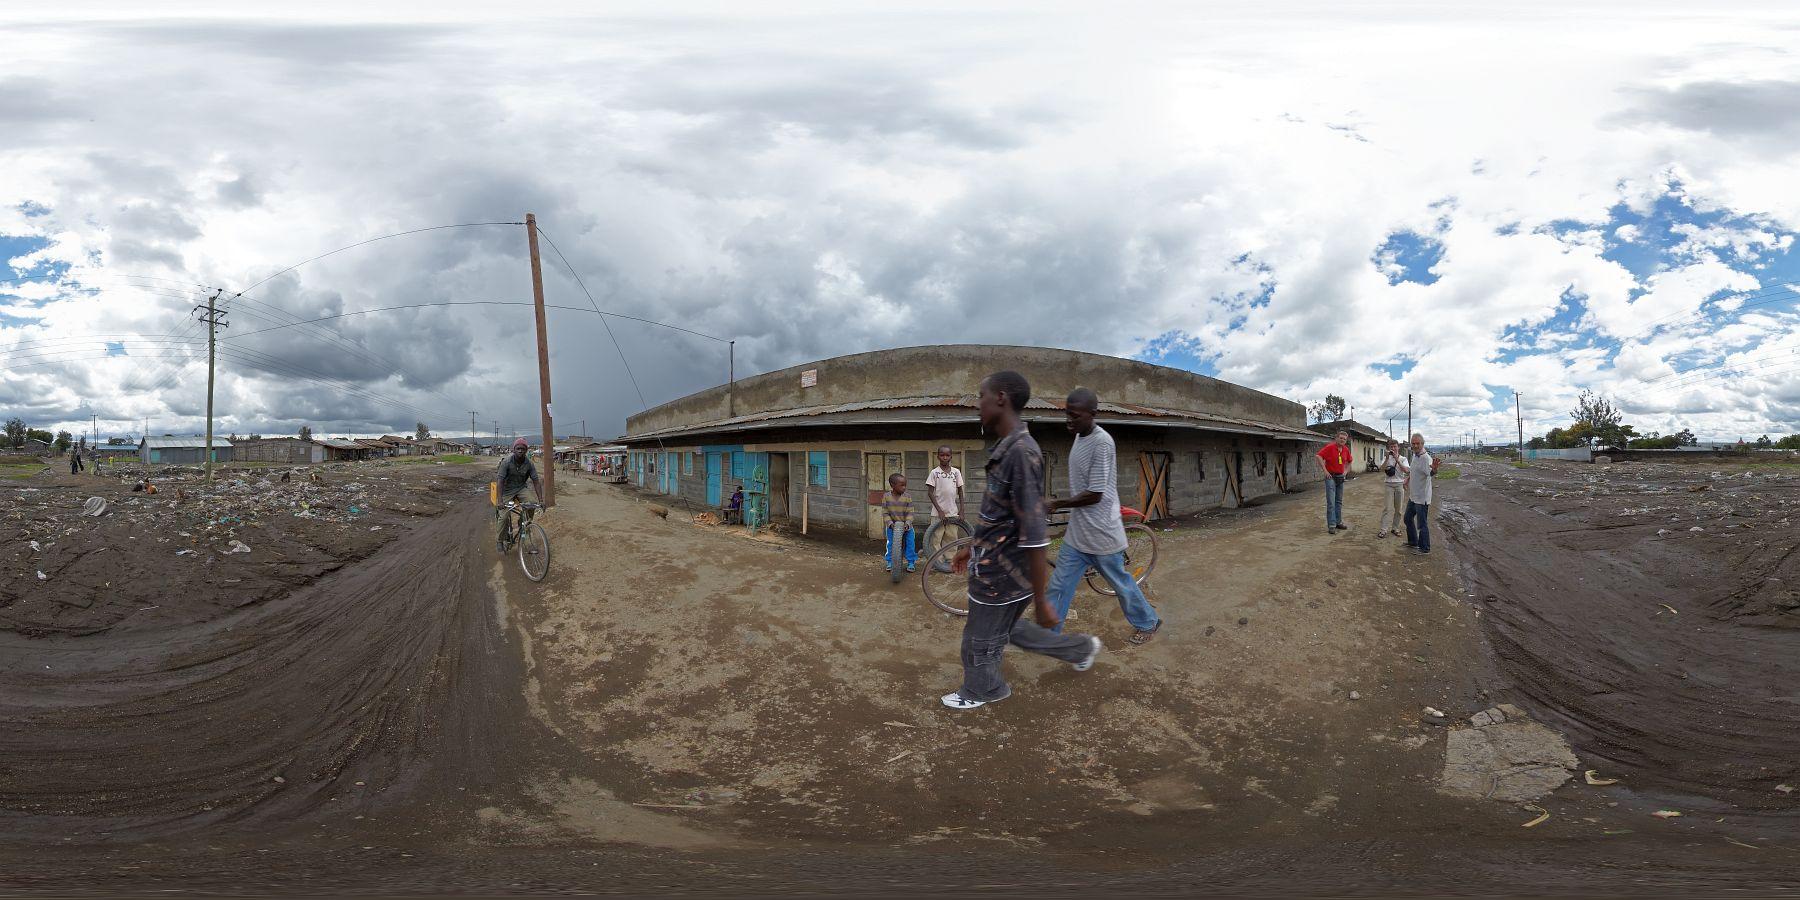 Panorama Kenia Nakuru Aidsfrauen 2